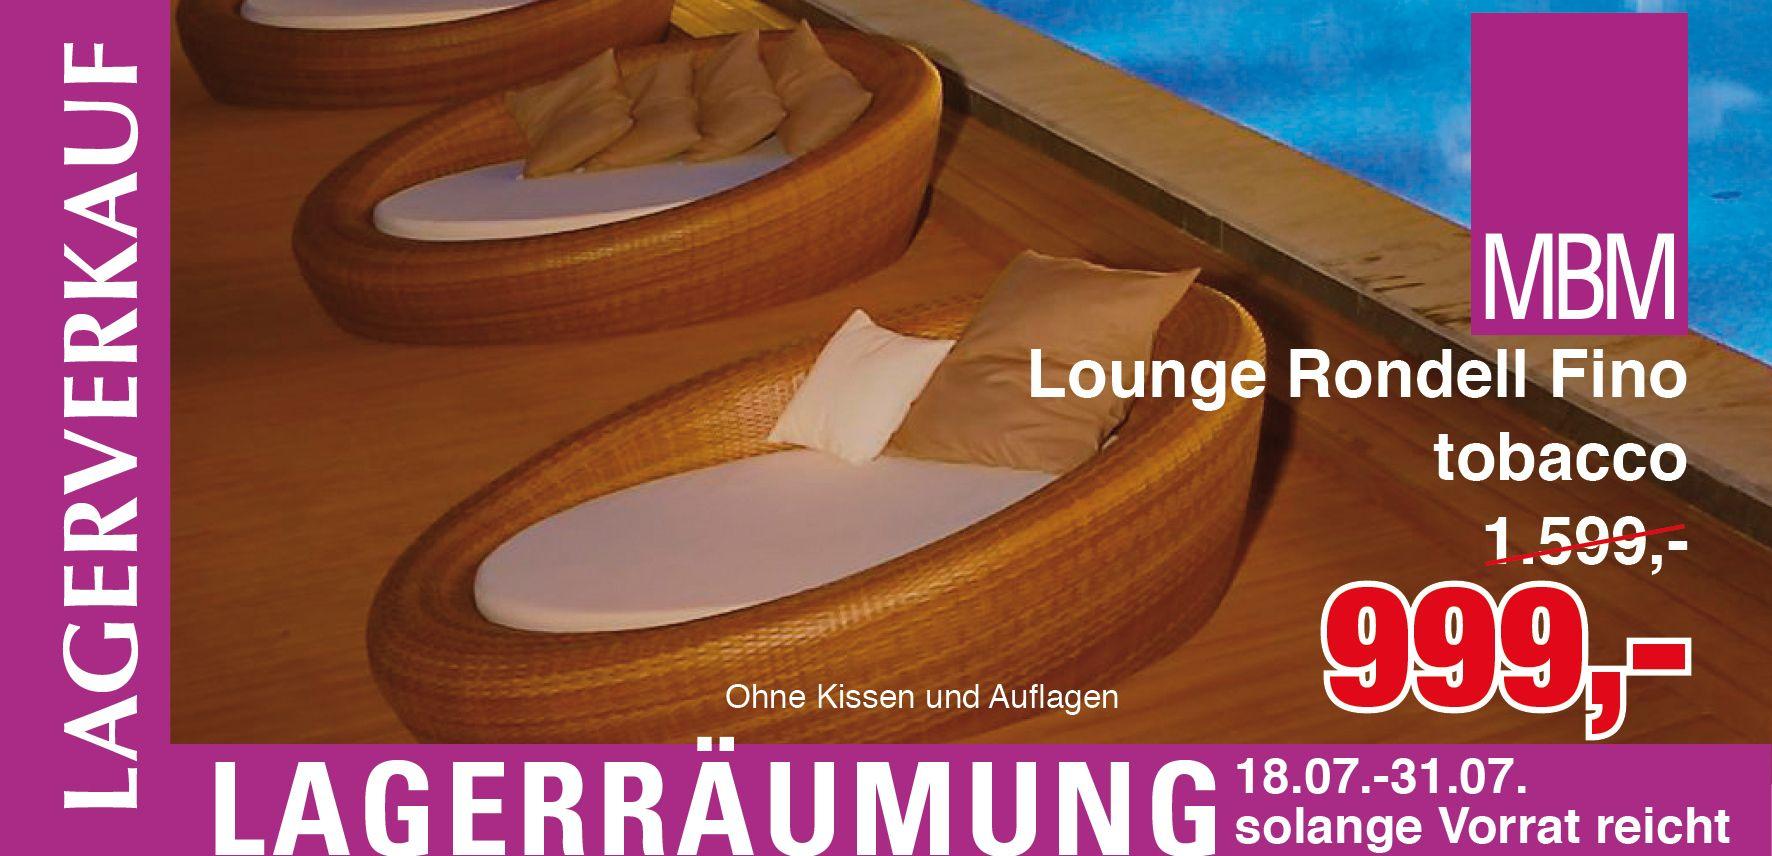 Lounge Rondell Fino Mbm Gartenmobel Lagerverkauf Lounge Gartenmobel Alles Muss Raus